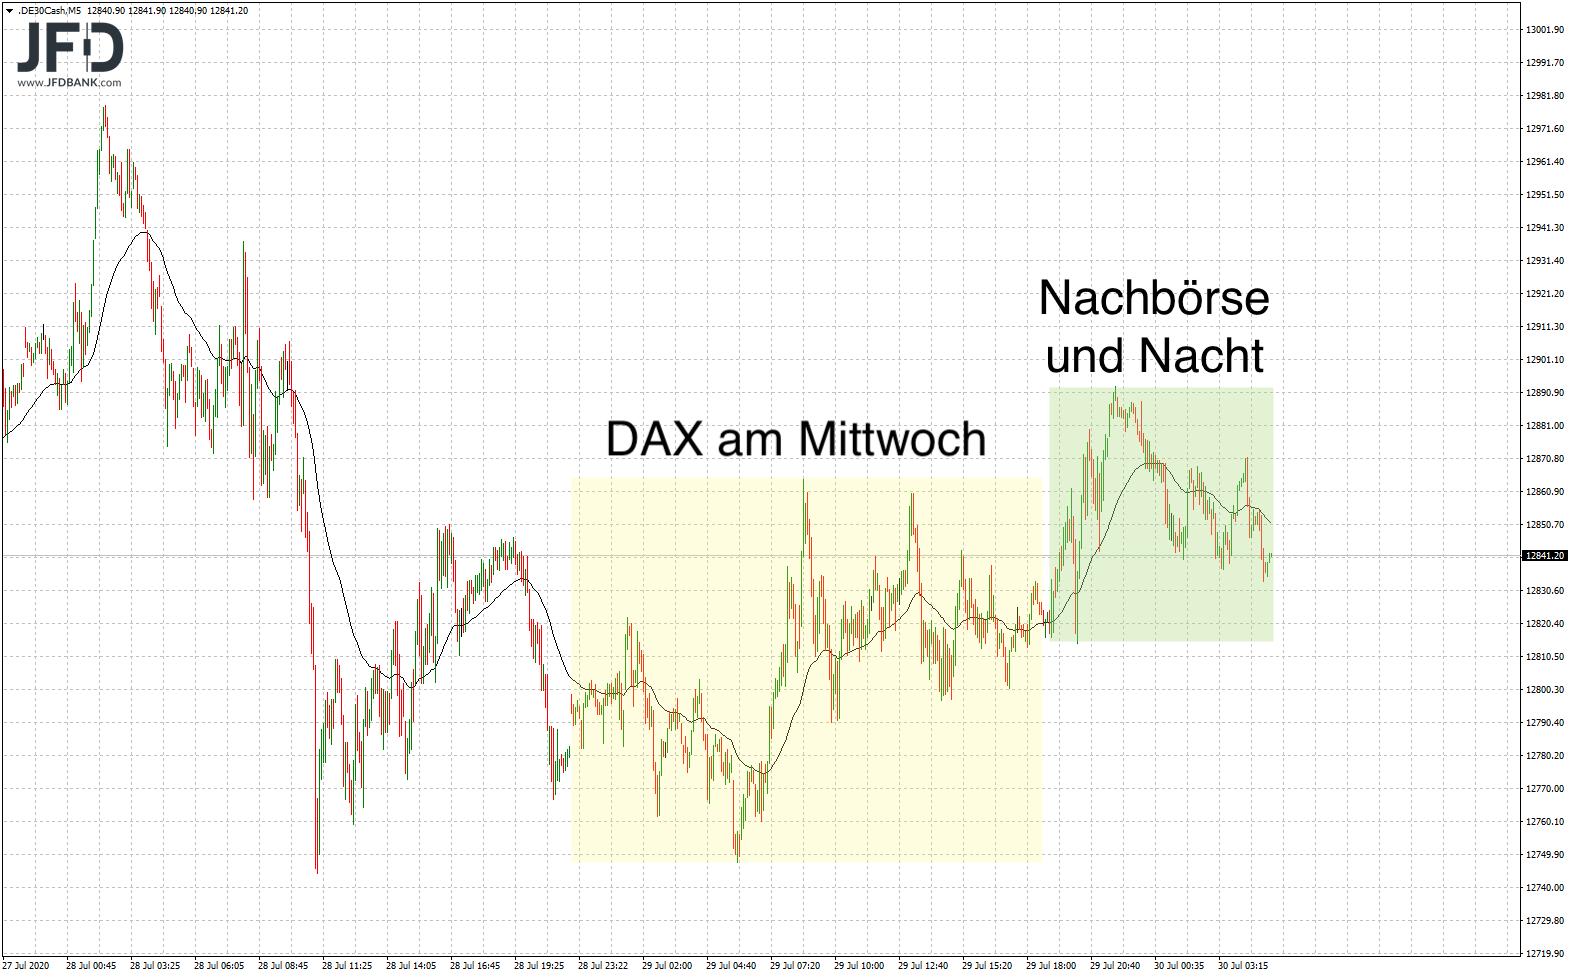 DAX-Signale-nach-der-FED-Sitzung-Kommentar-JFD-Bank-GodmodeTrader.de-2